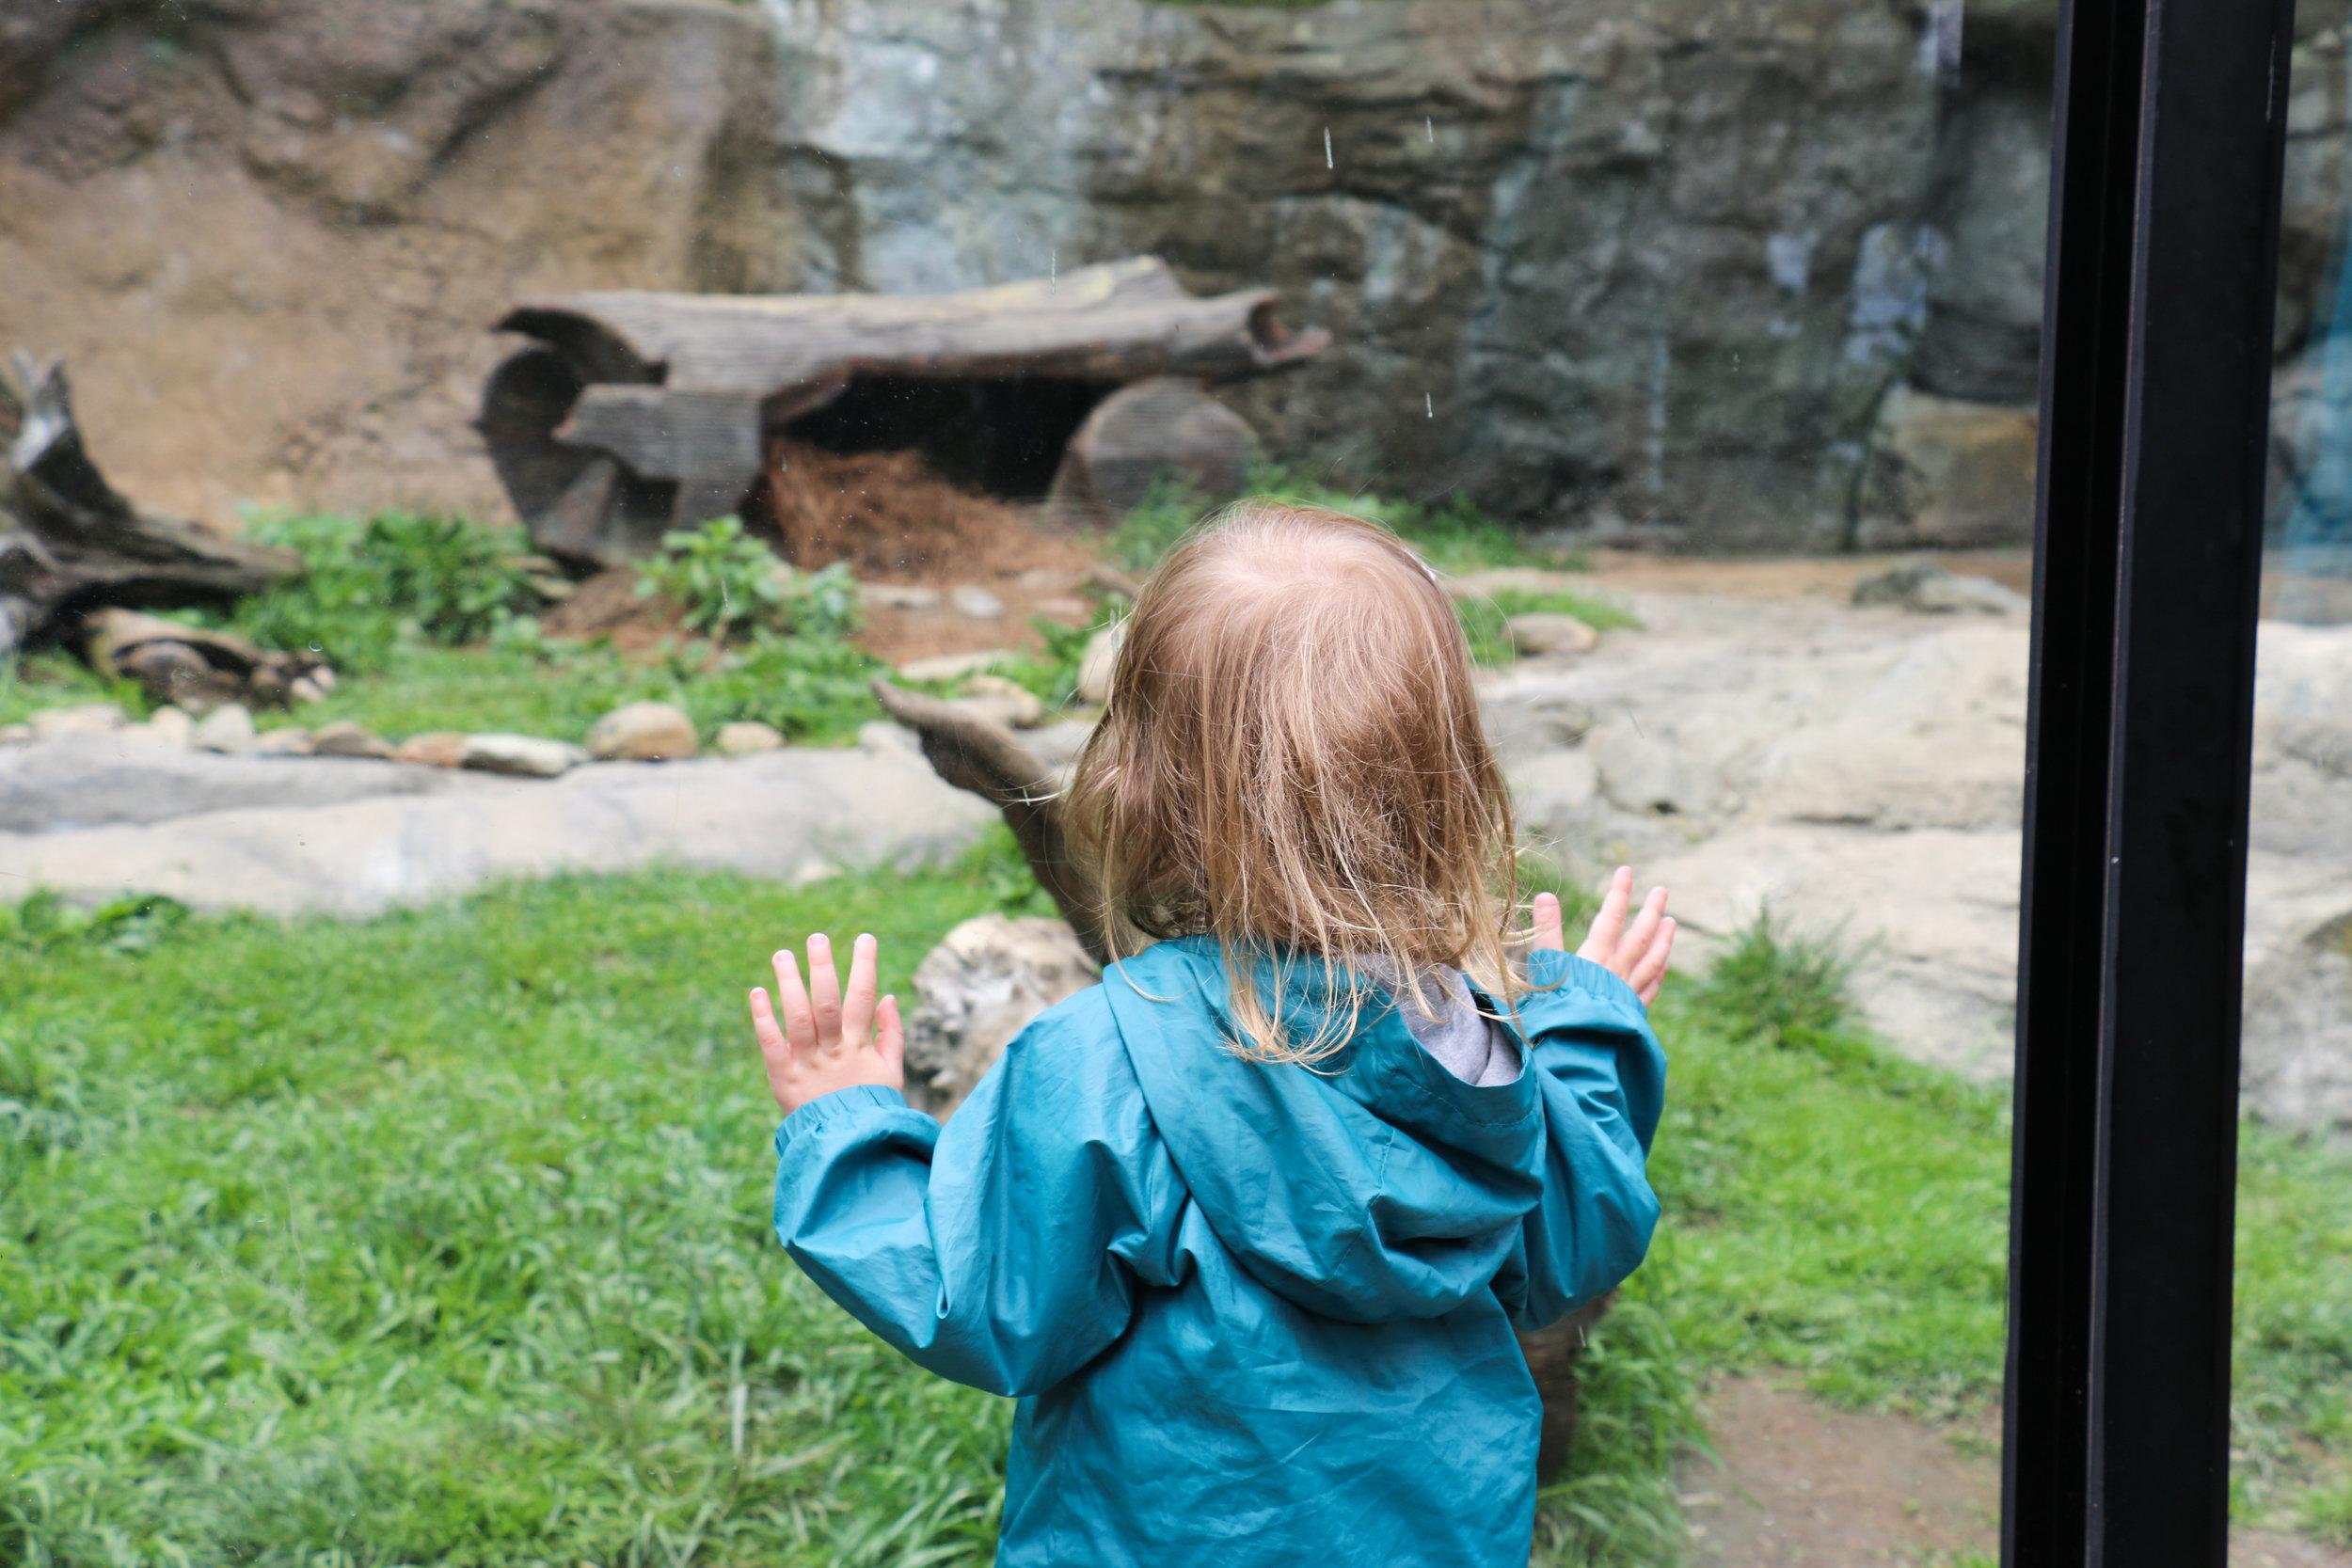 grandfather-mountain-wildlife-habitat-clm-otter